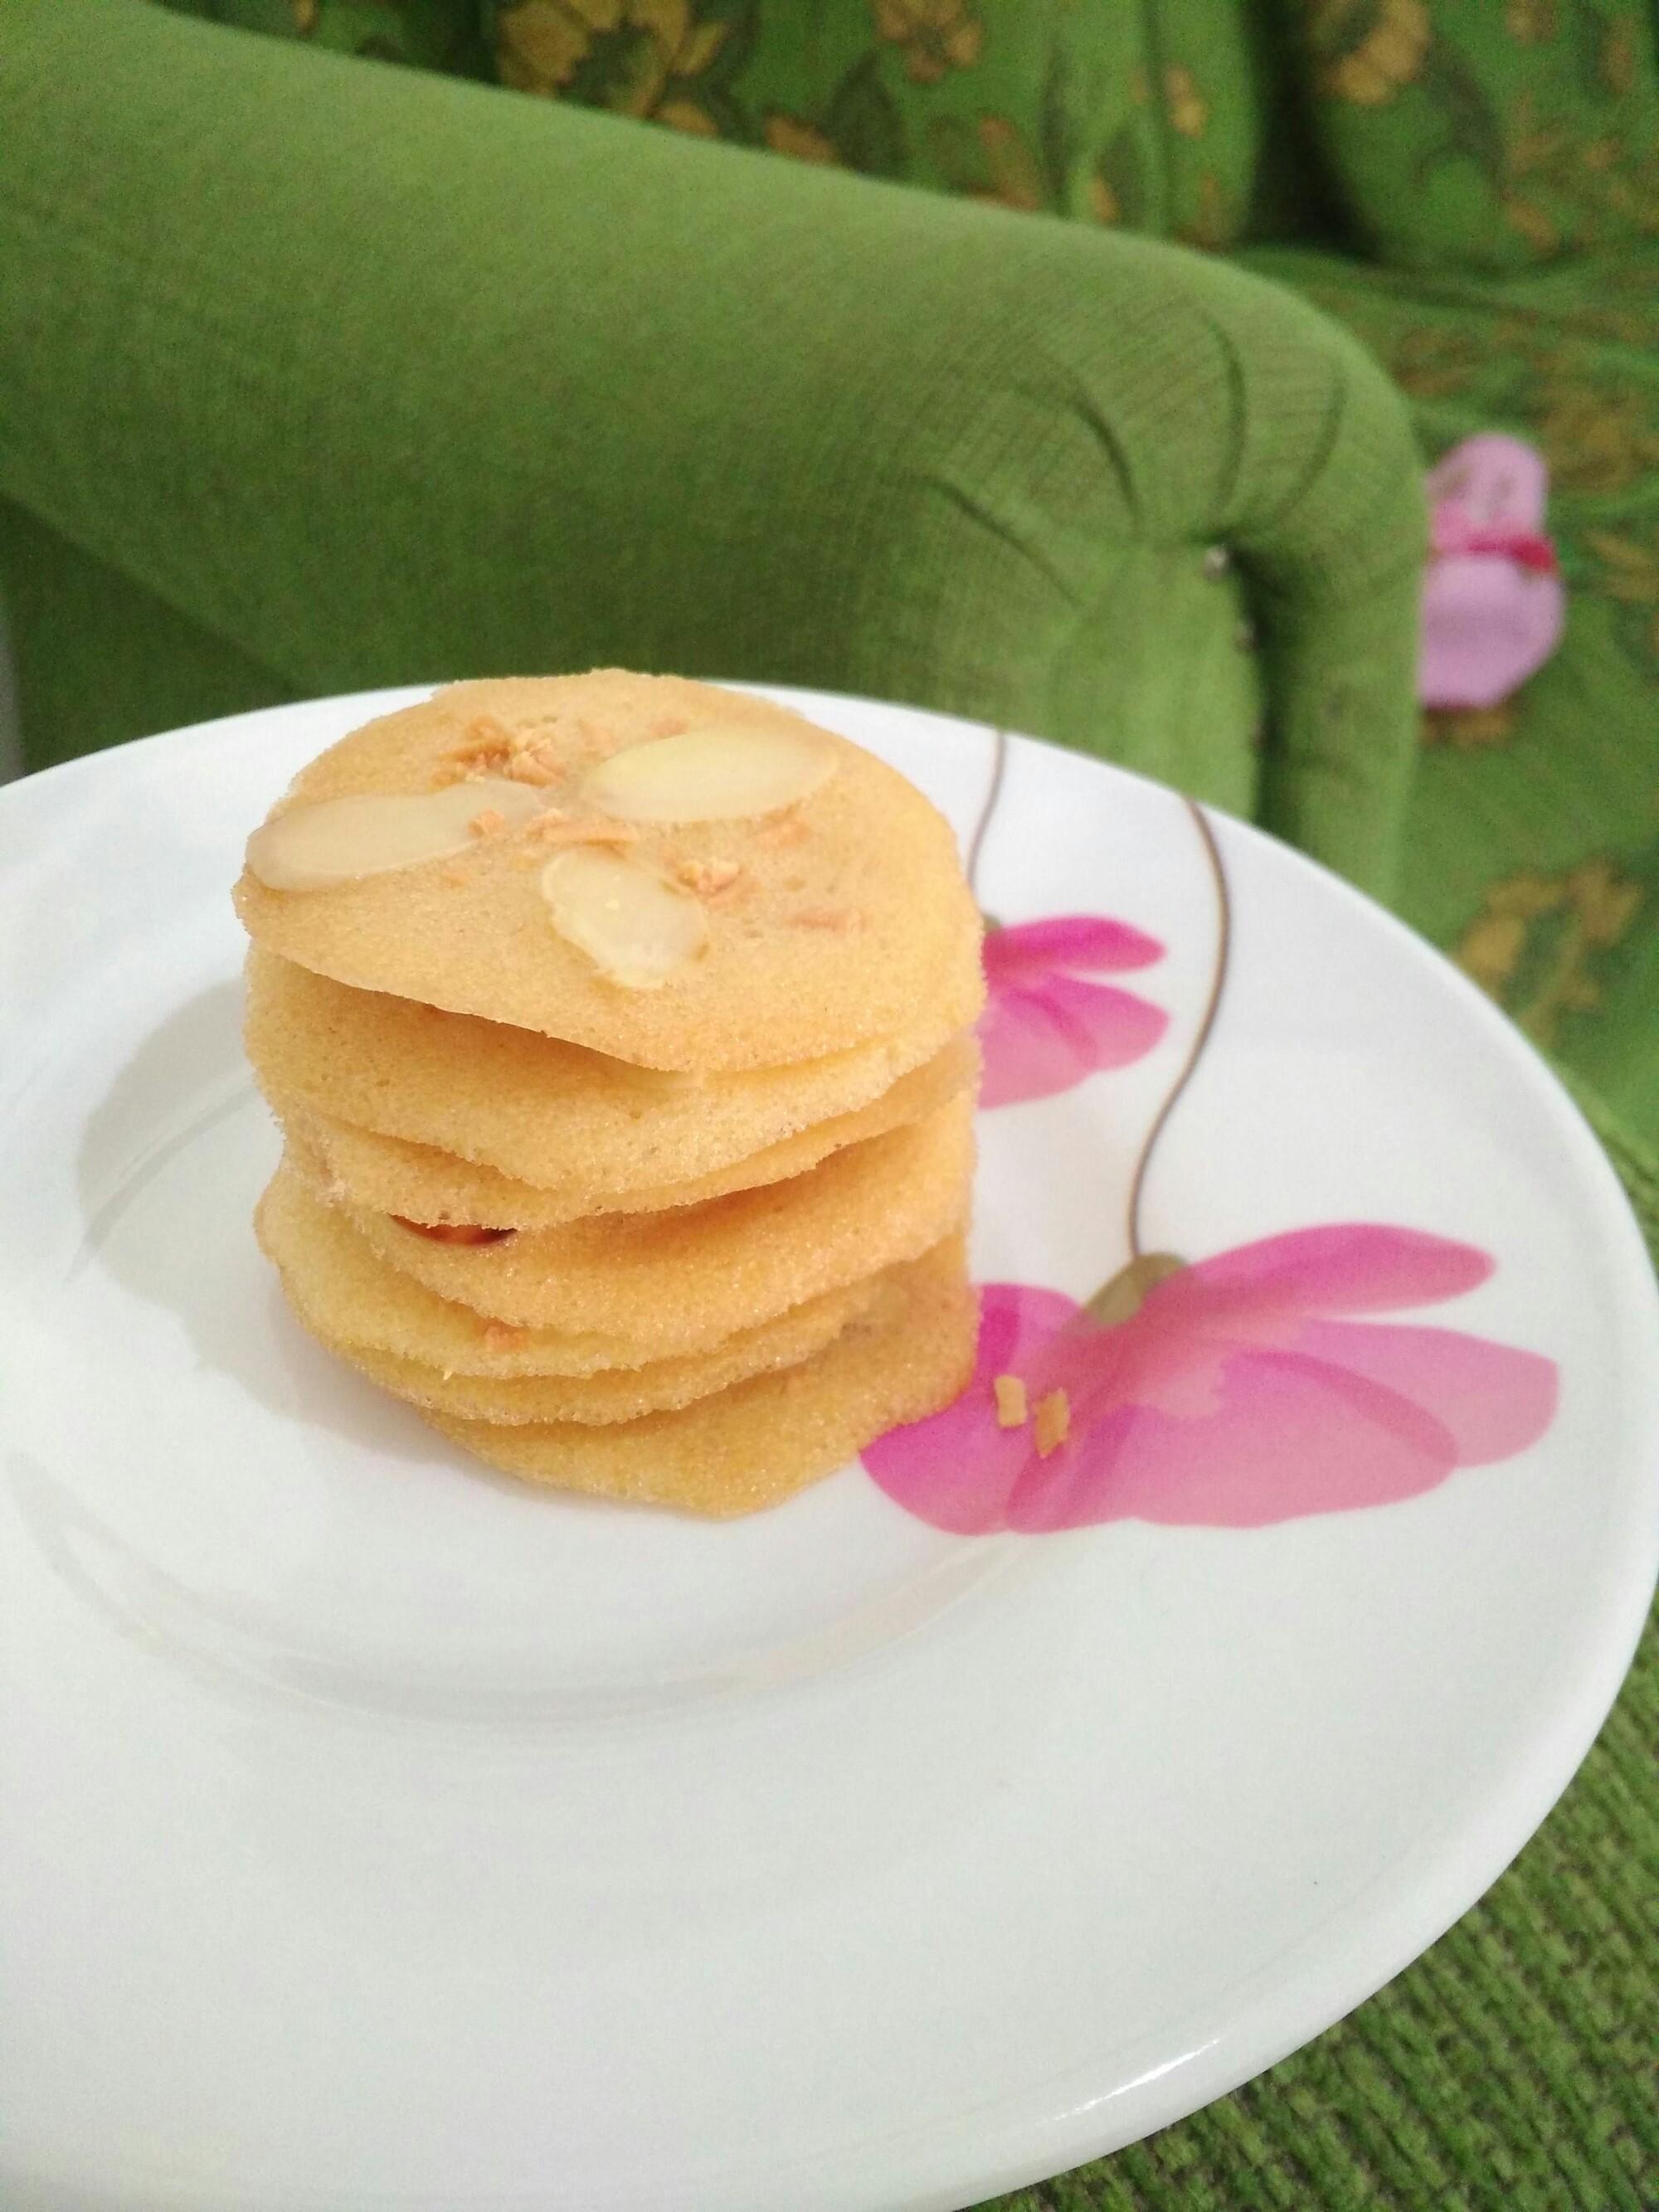 Homemade Almond Crispy Cheese By Me Sundariekowati